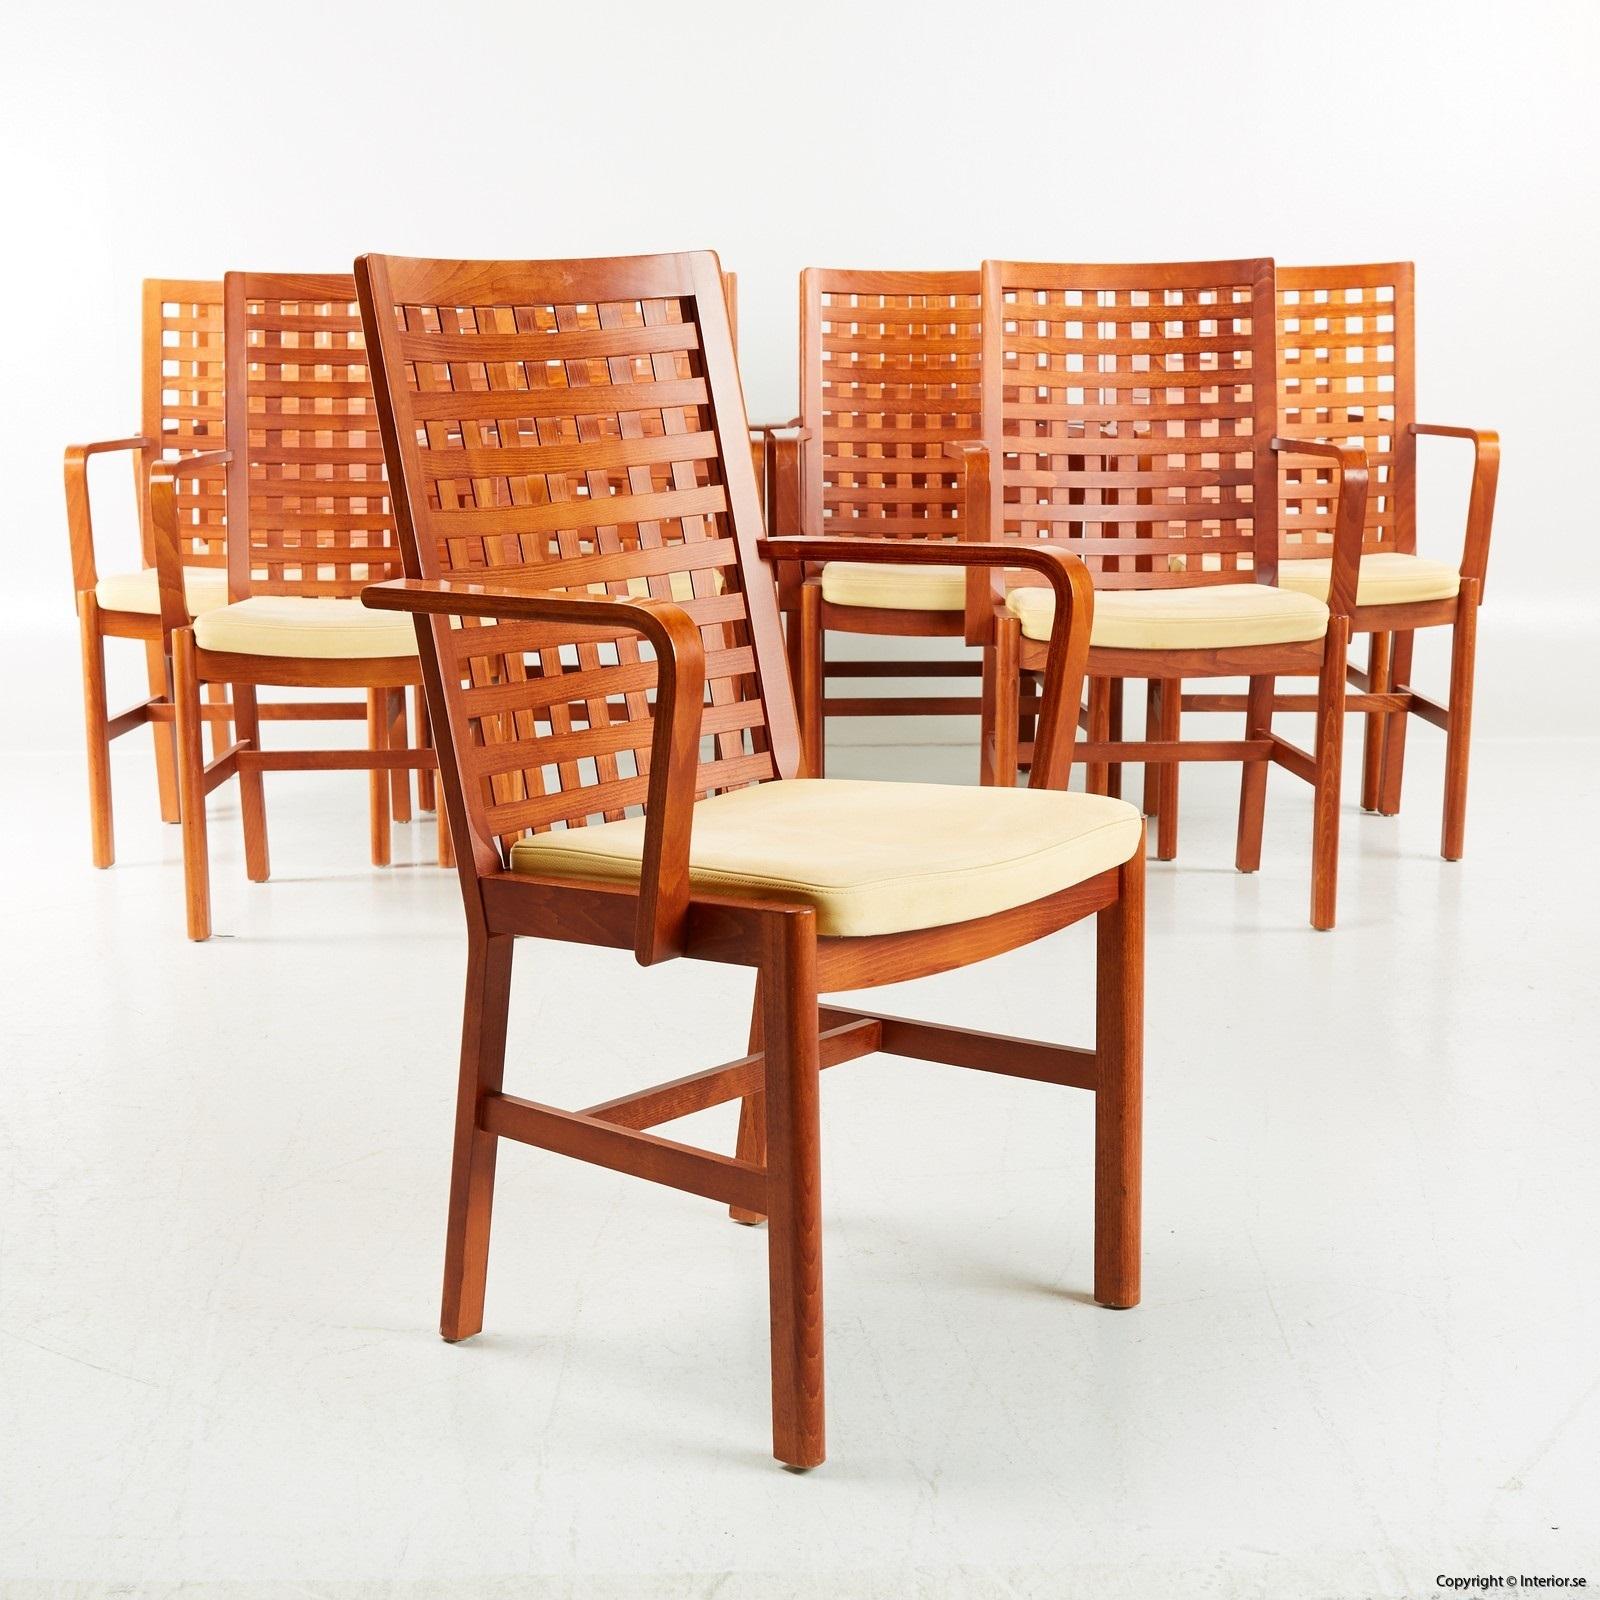 1 Konferensstolar Conference Chairs, Kvist Industries - Lädersits - Design furniture (4)